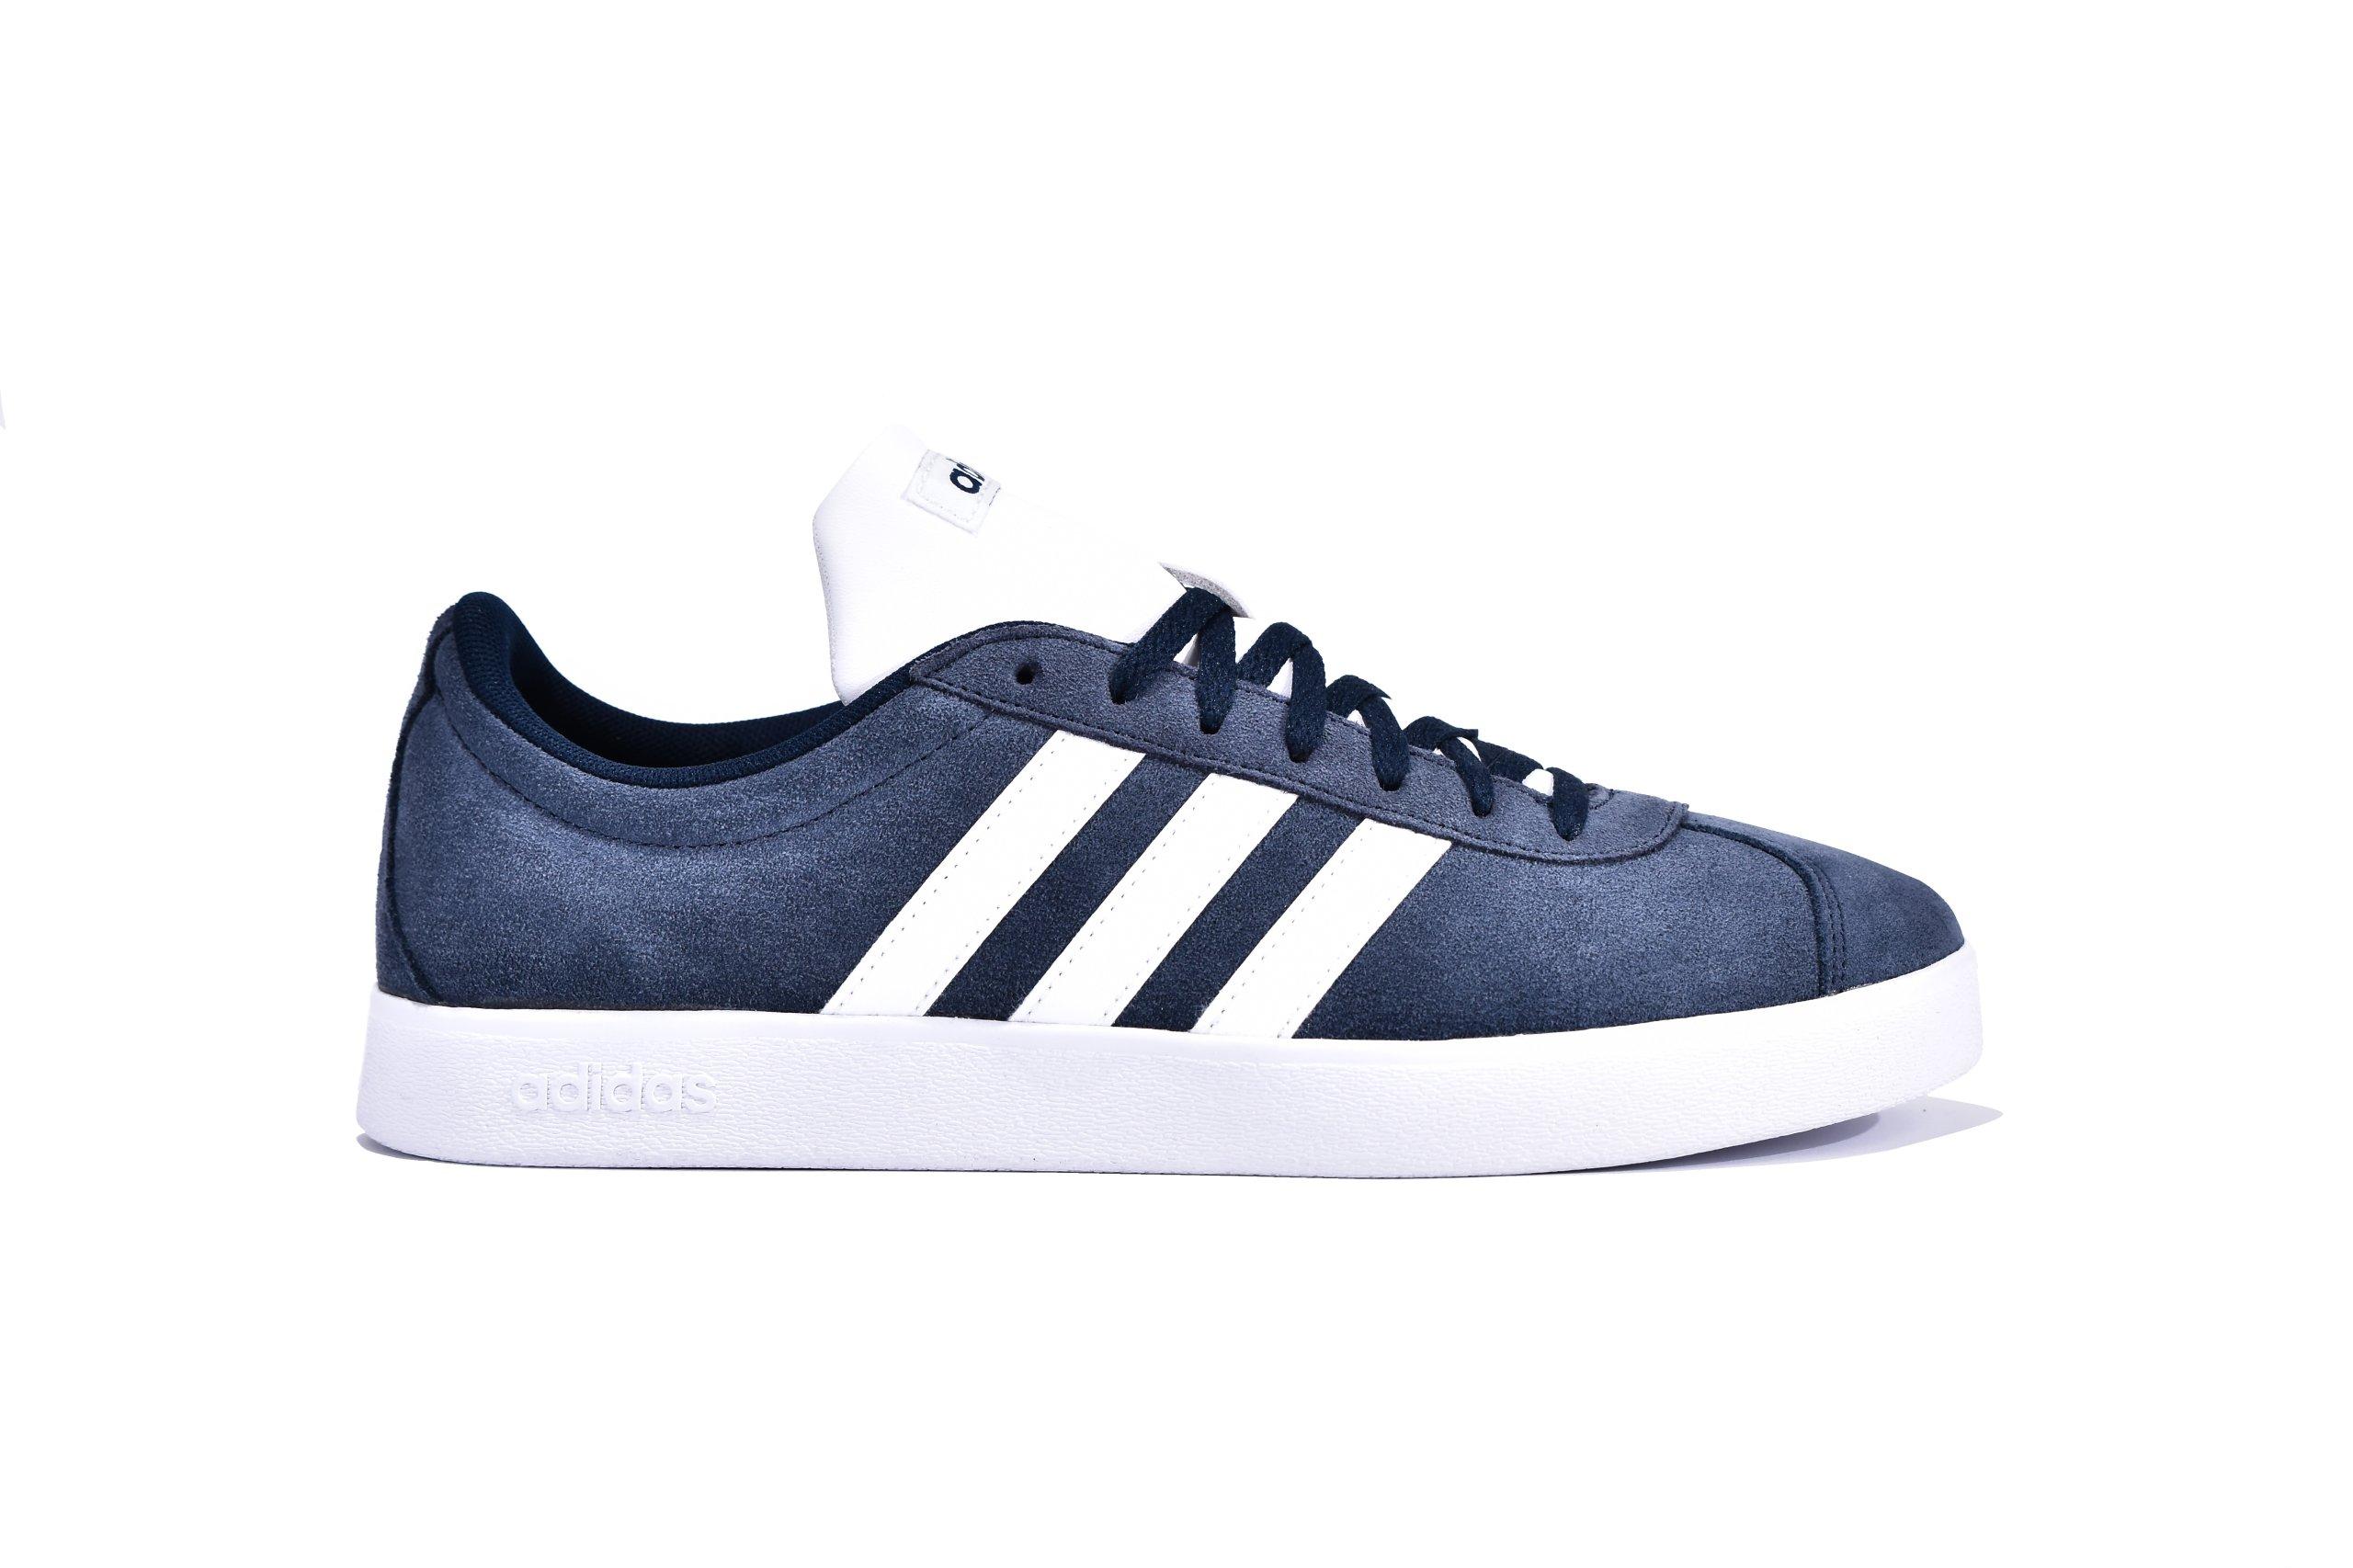 Autentyczny Buty Męskie adidas Originals VL Court 2 0